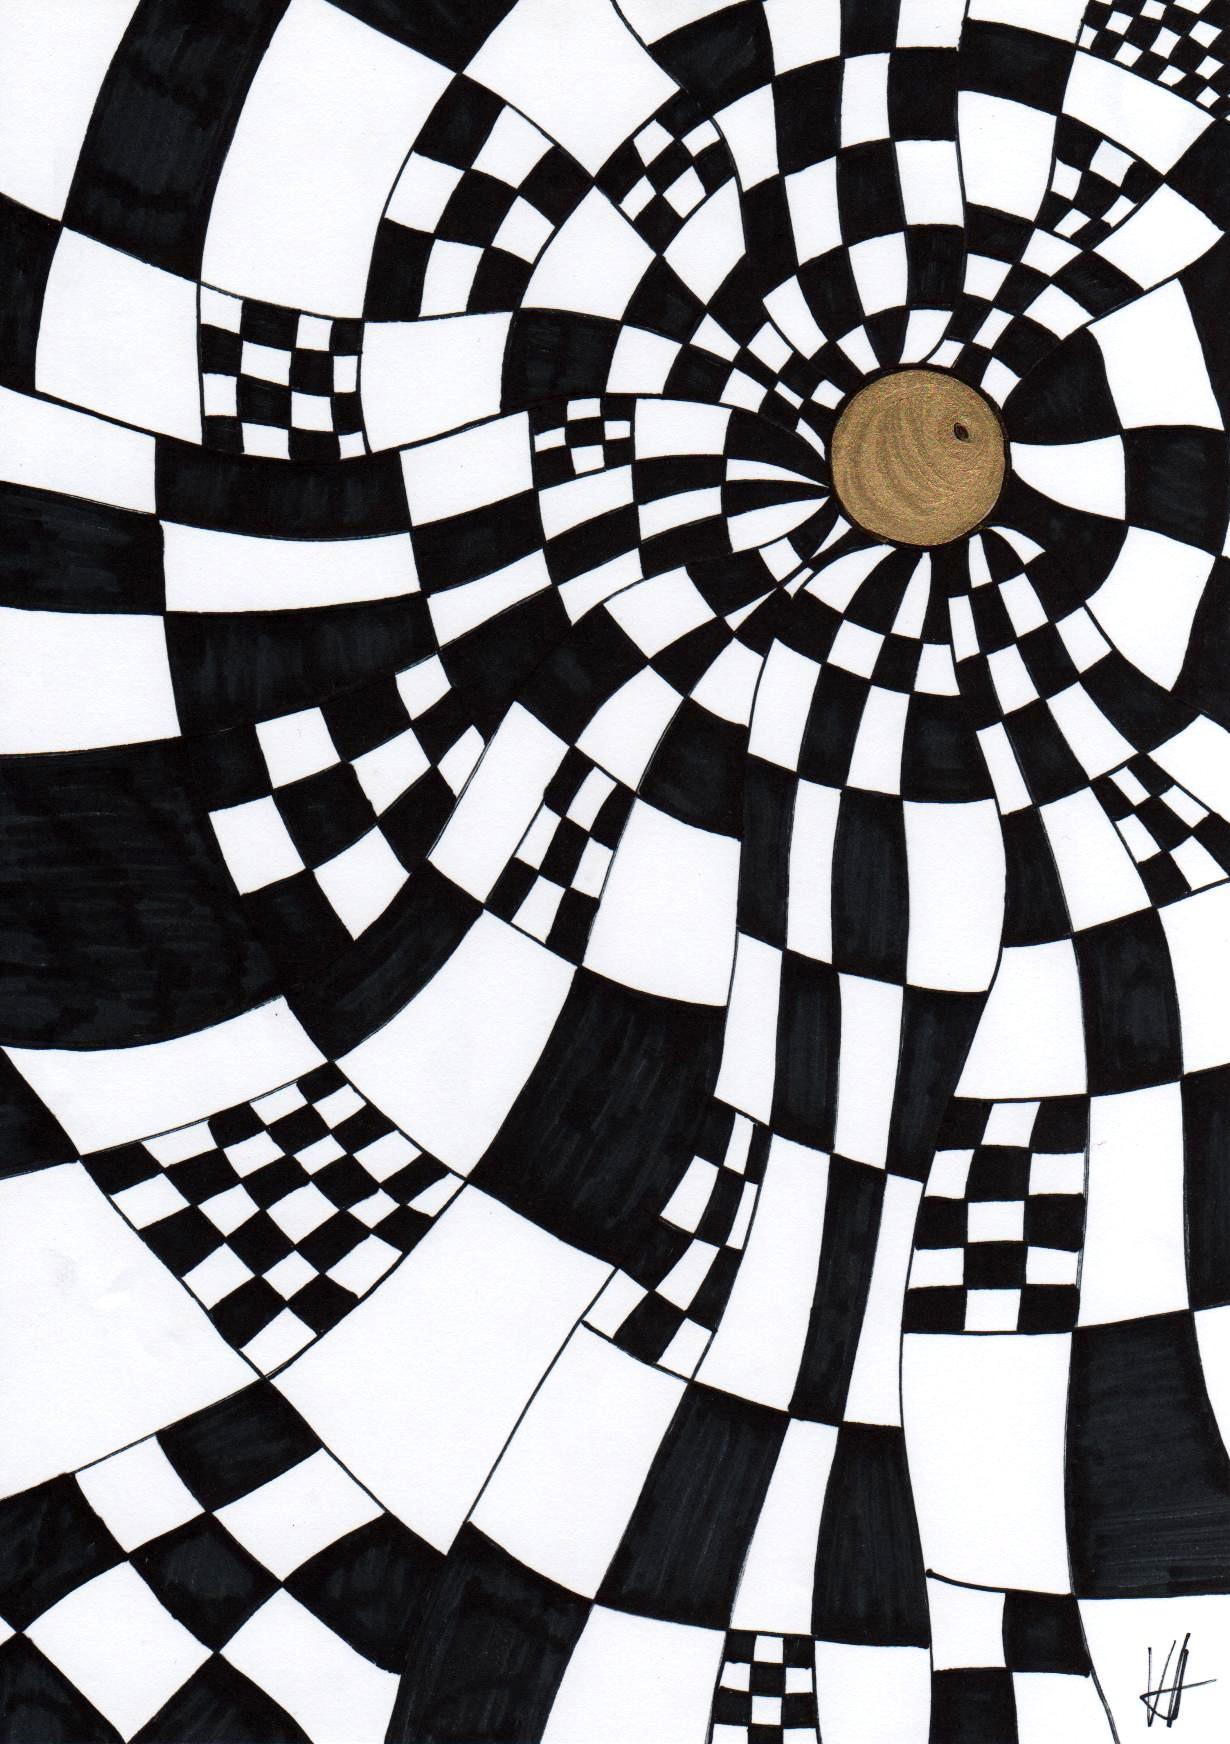 schwarz+weiß=grau? » schach-matt